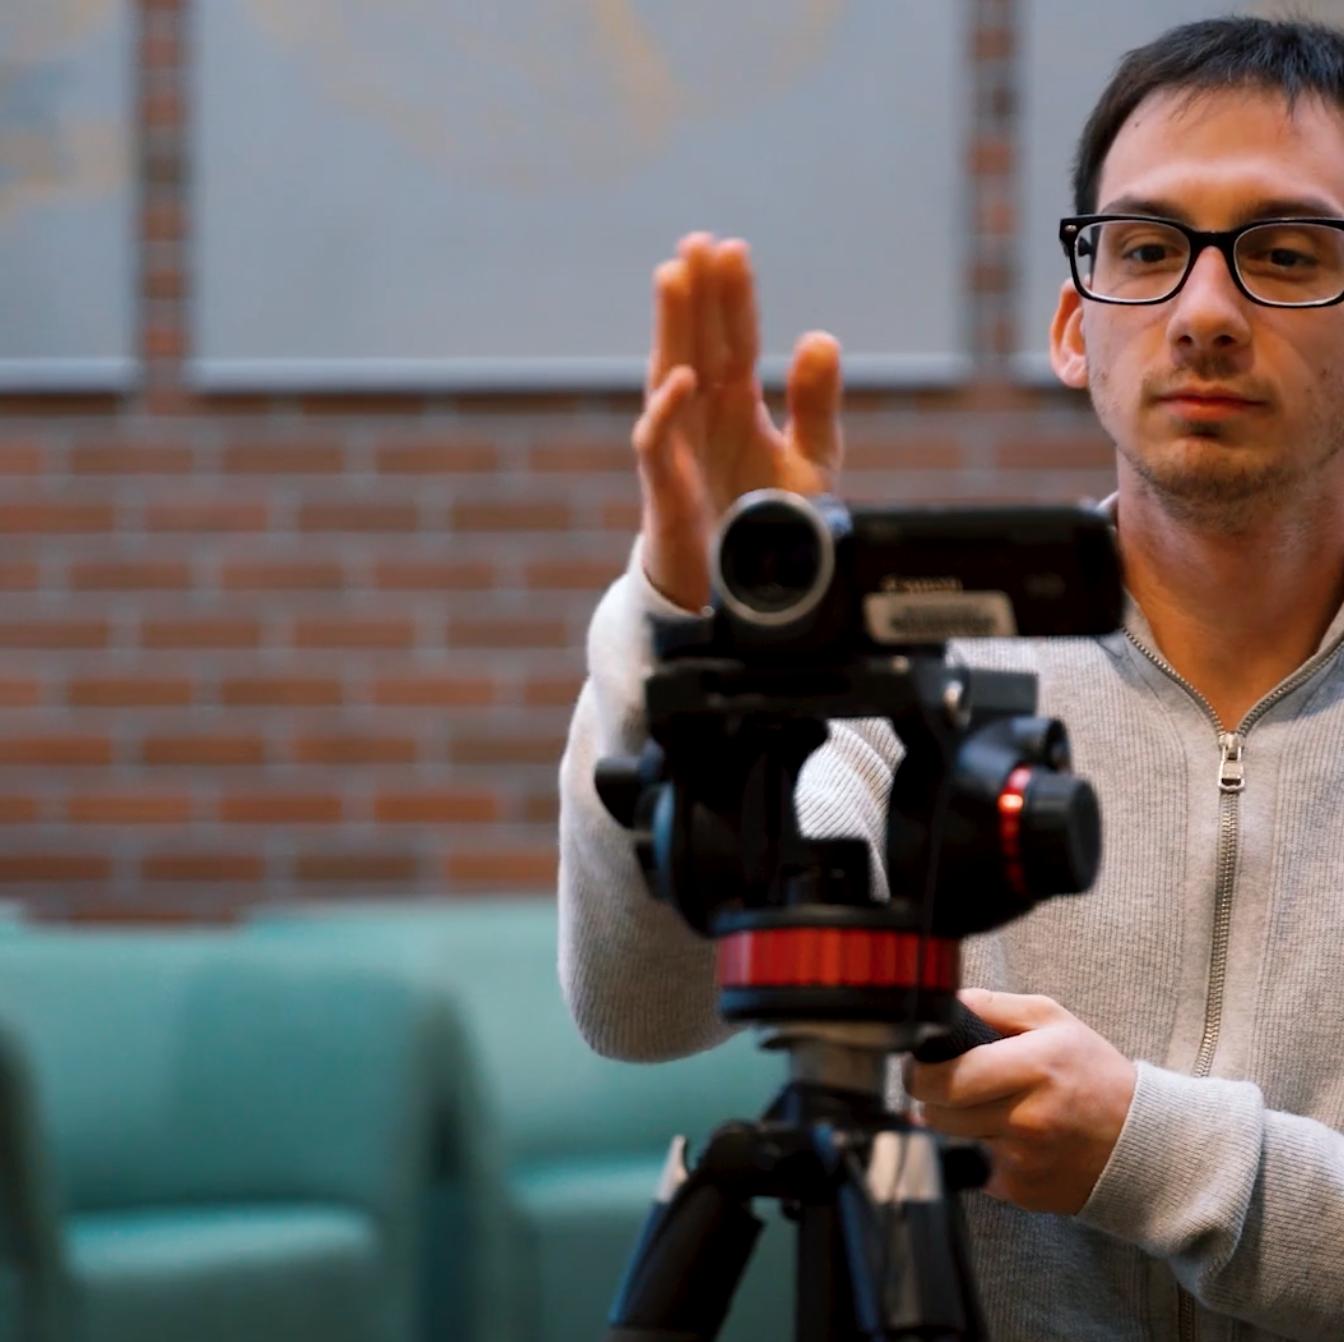 Man behind video camera aligning shot.